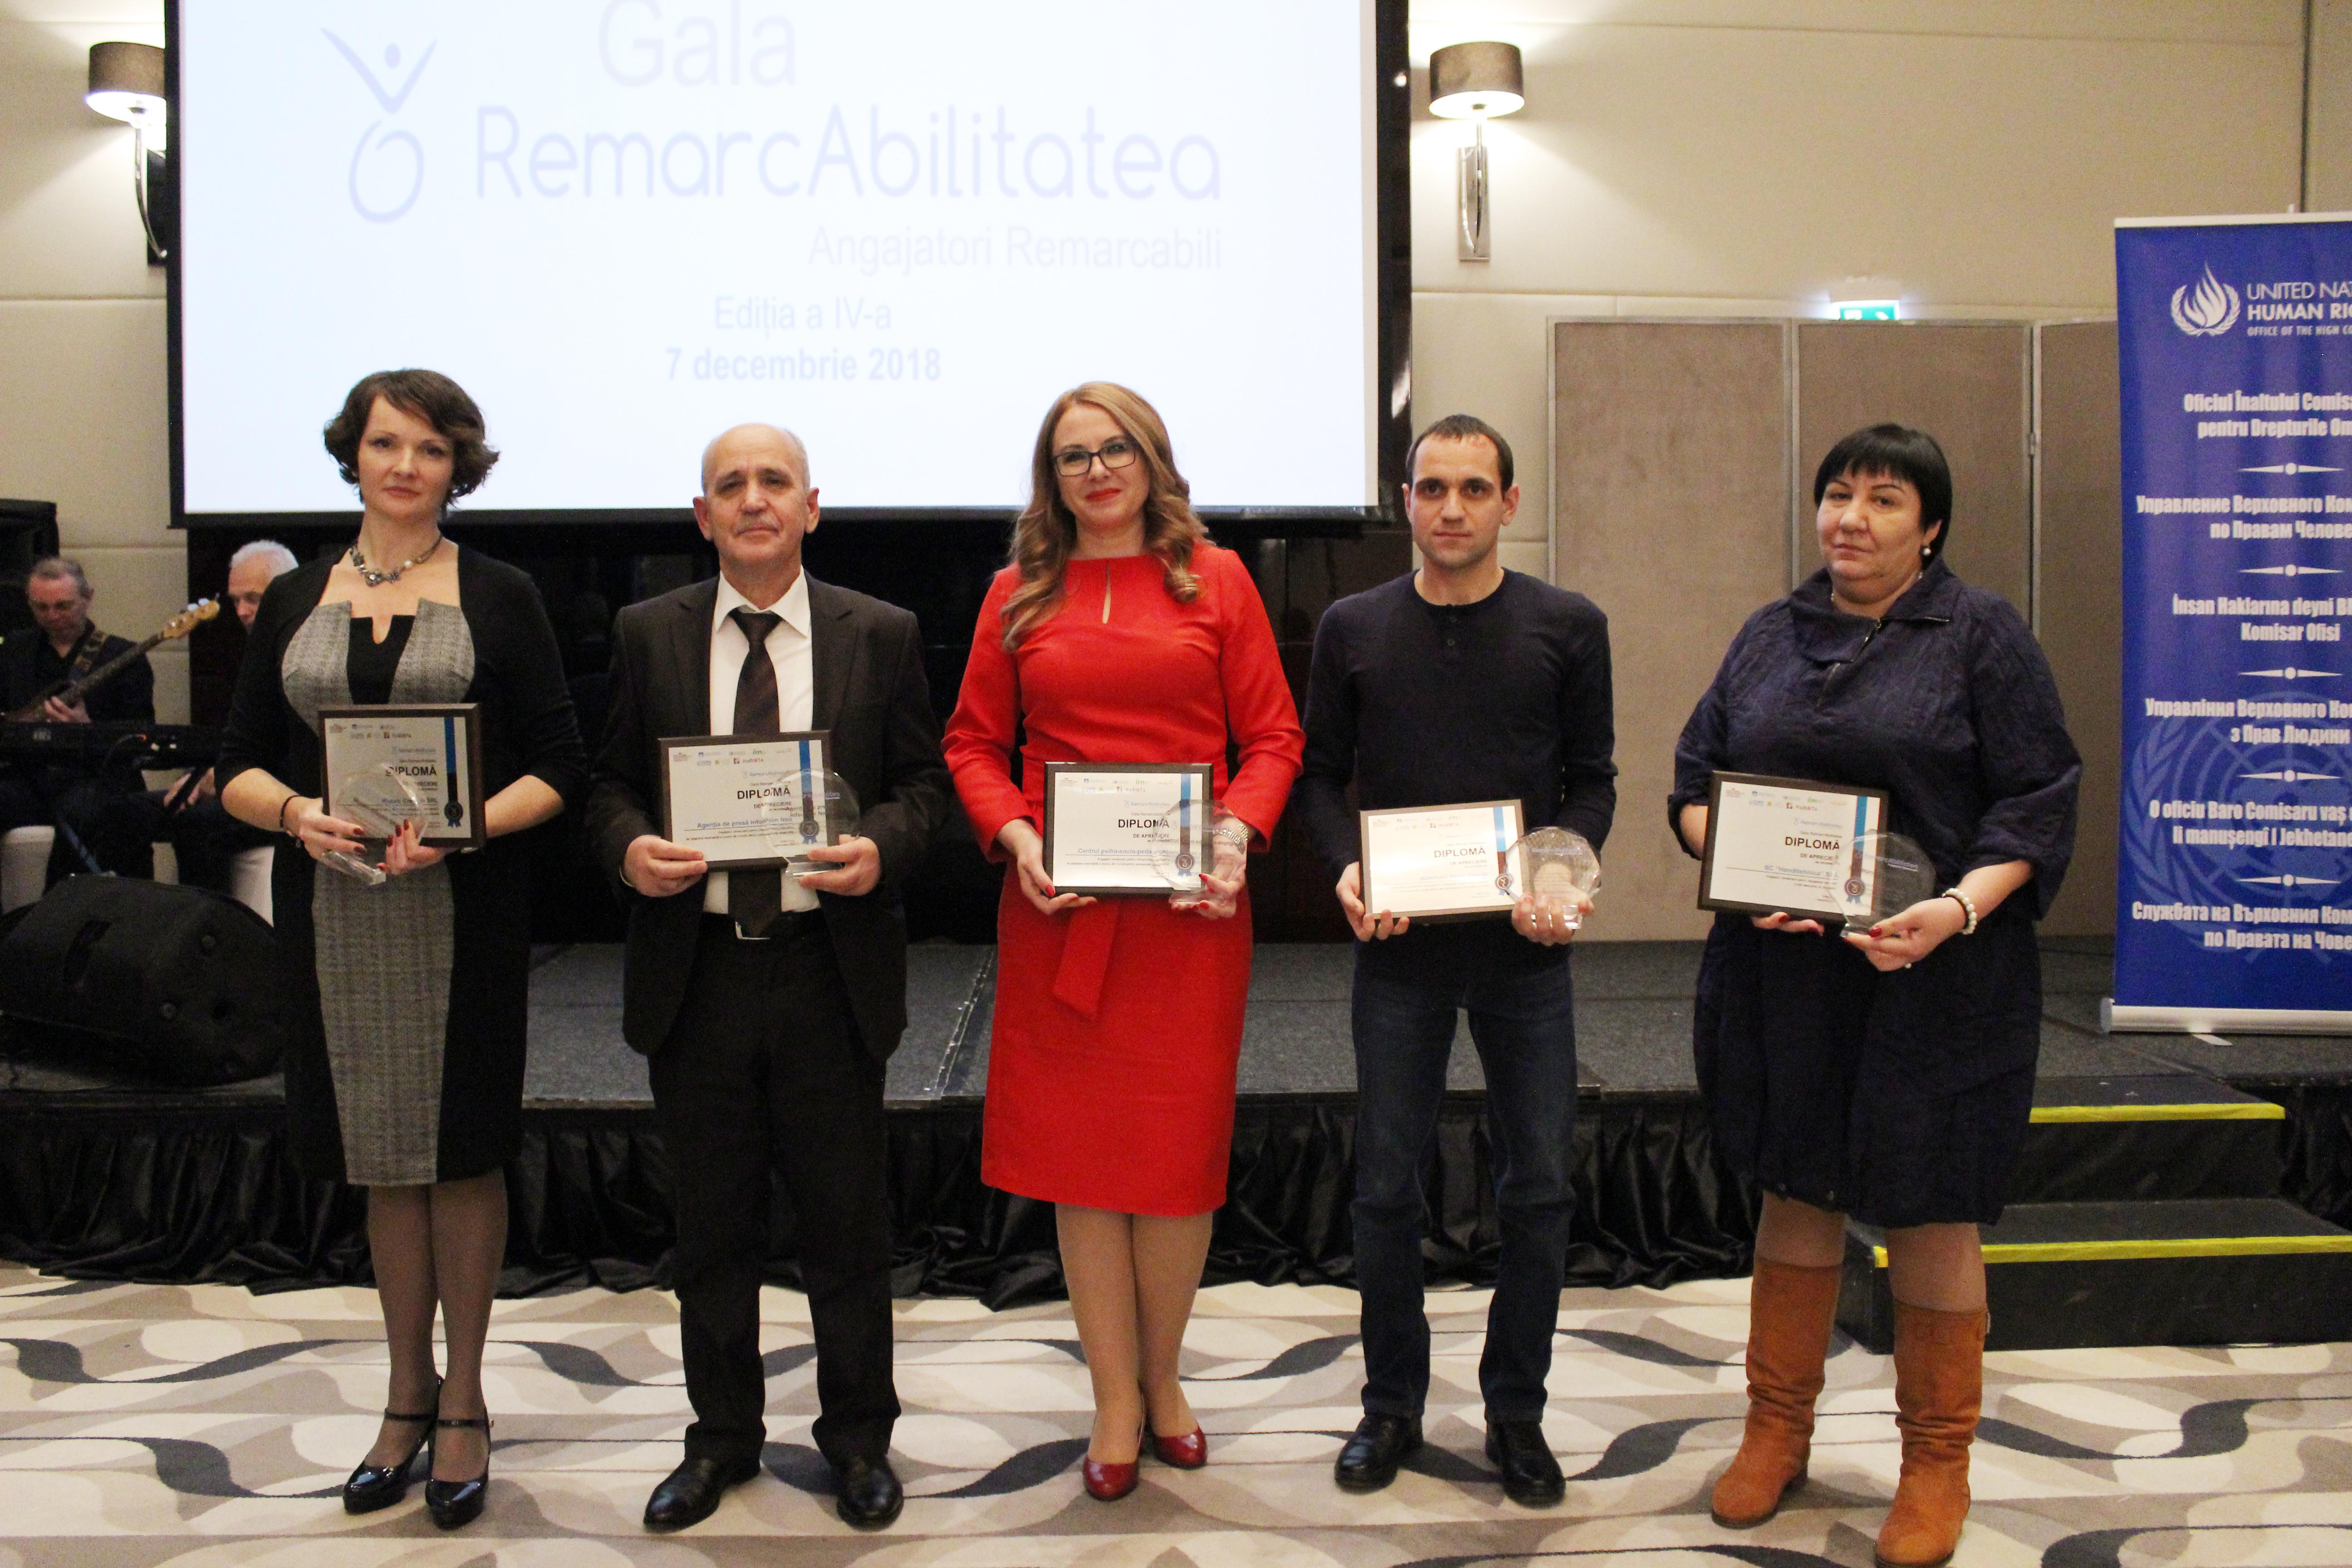 Gala RemarcAbilitatea Ediția a IV-a 2018